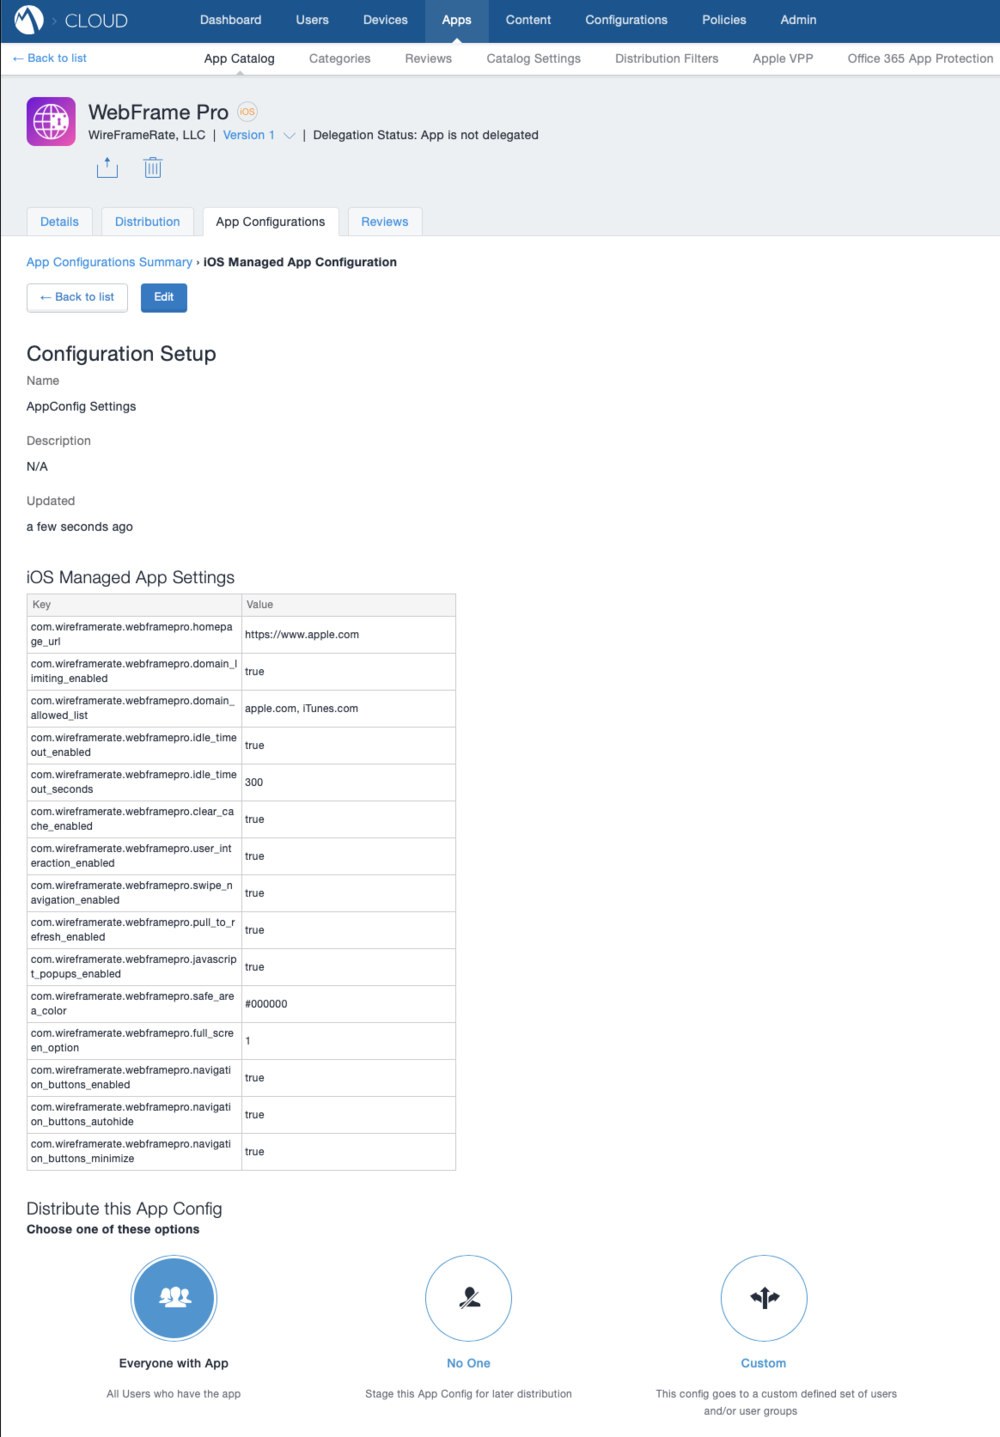 App Configuration Policy in MobileIron